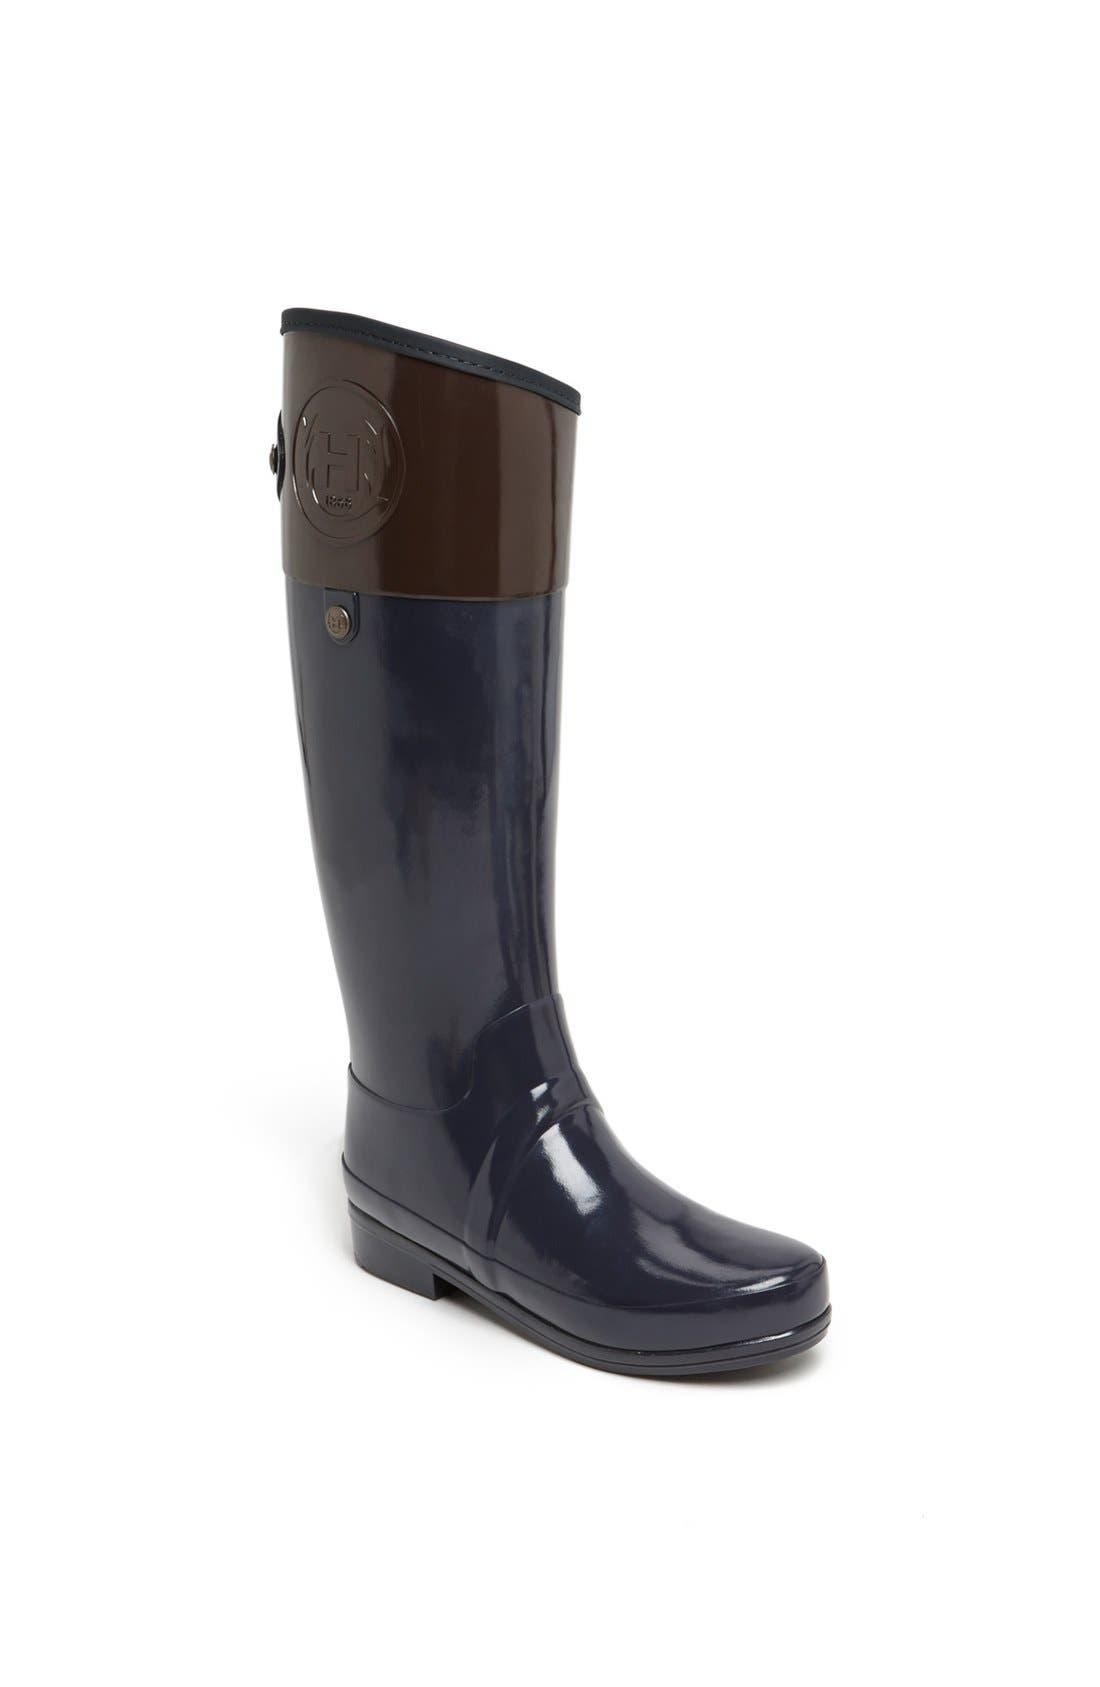 Alternate Image 1 Selected - Hunter 'Sandhurst Carlyle' Tall Riding Rain Boot (Women)